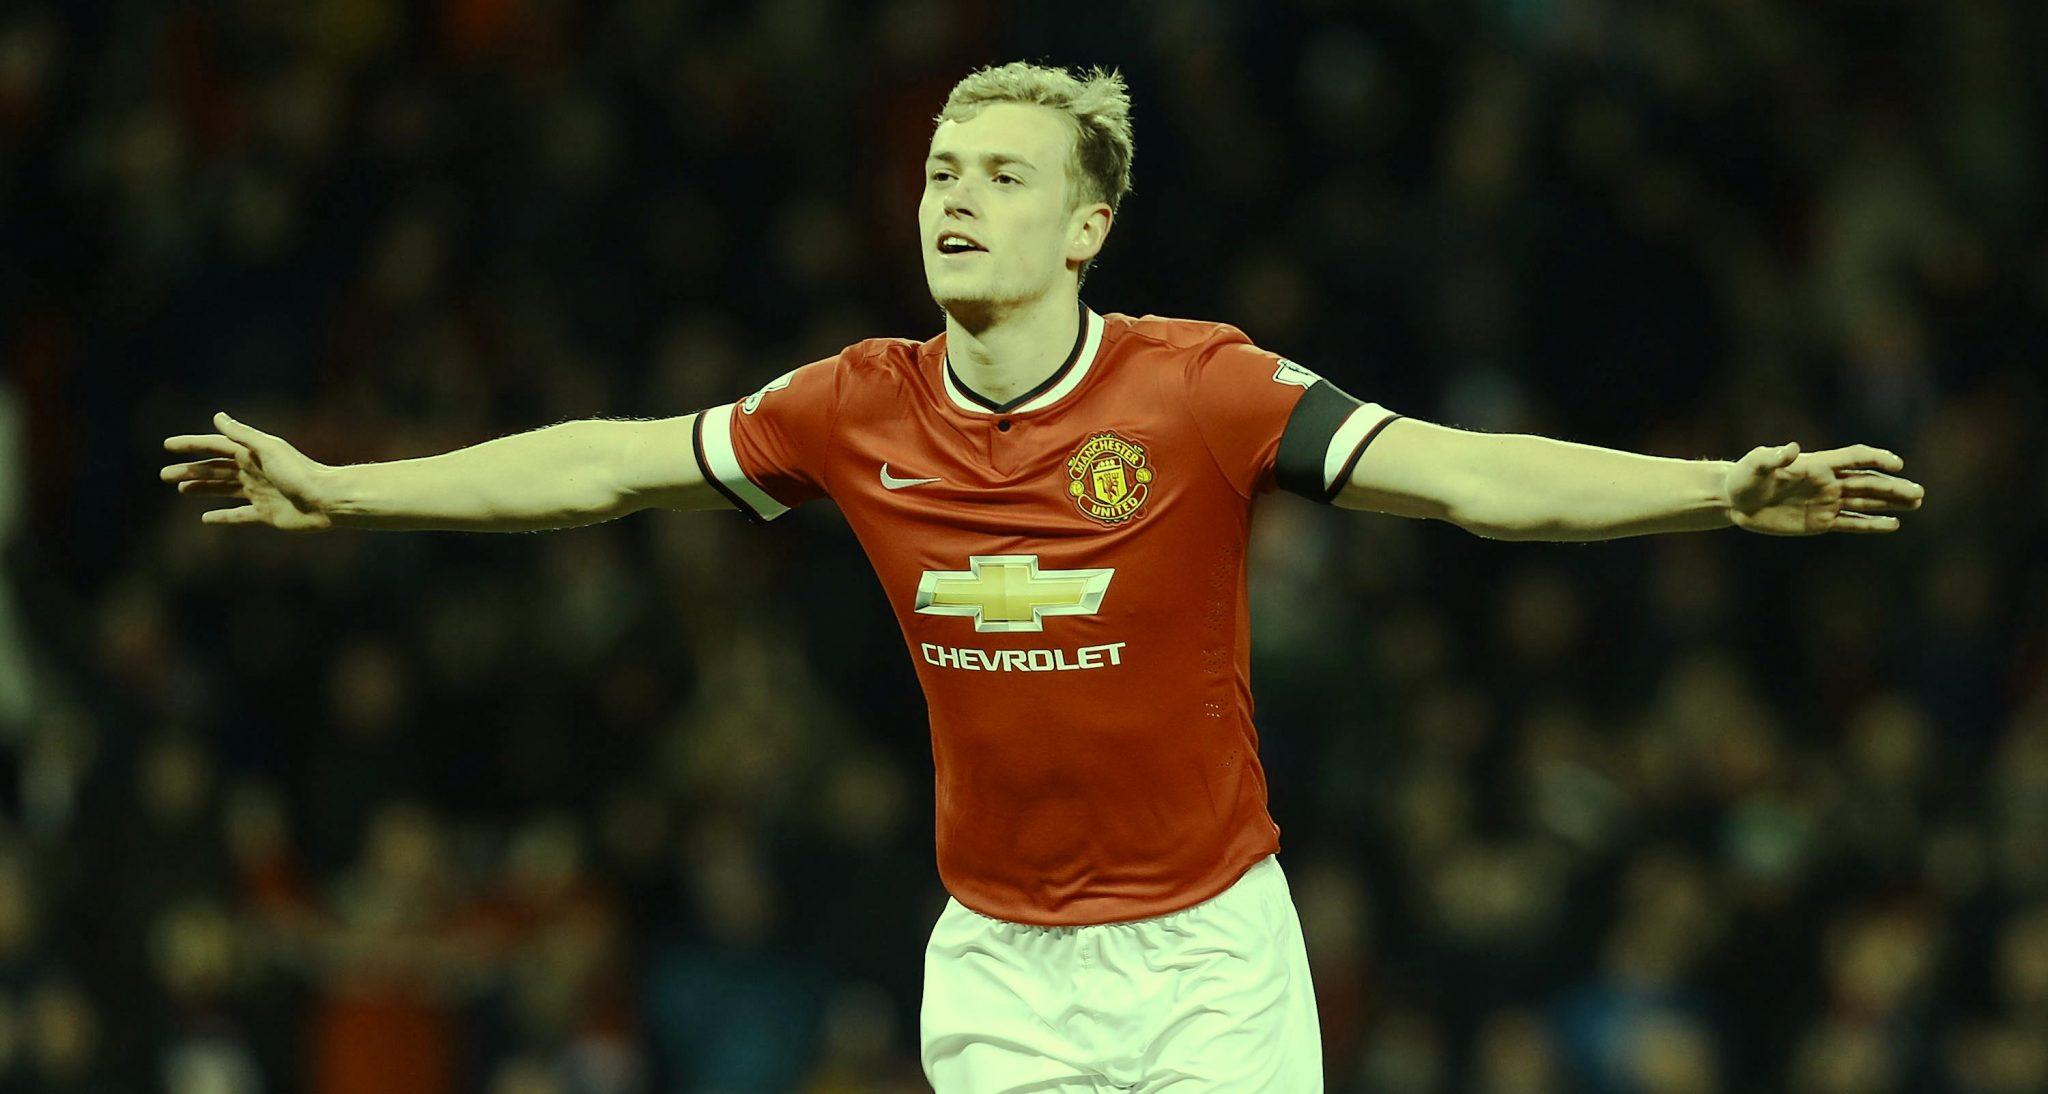 Nasib 5 Pemain Muda Manchester United Sebelum Jendela